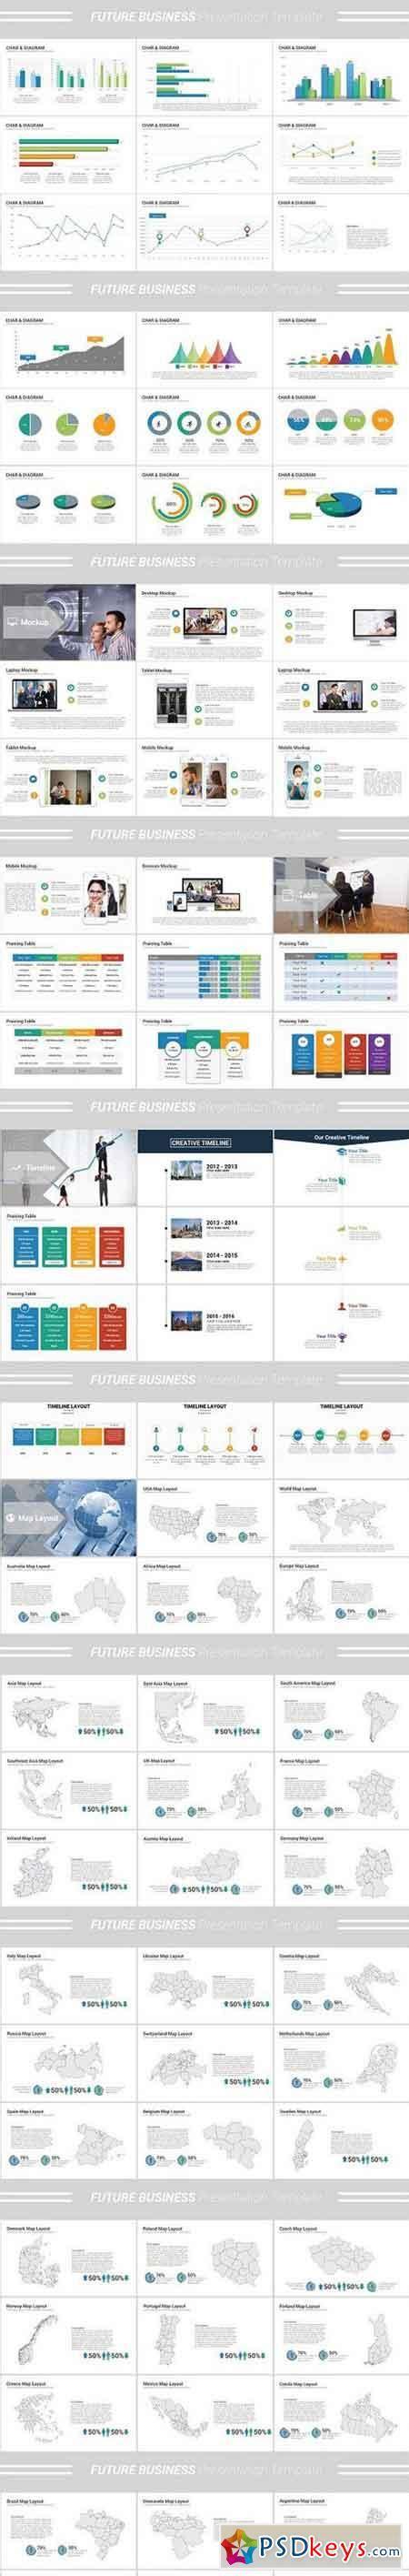 18 Professionally Designed Keynote Templates Free Future Business Keynote Template 1503587 187 Free